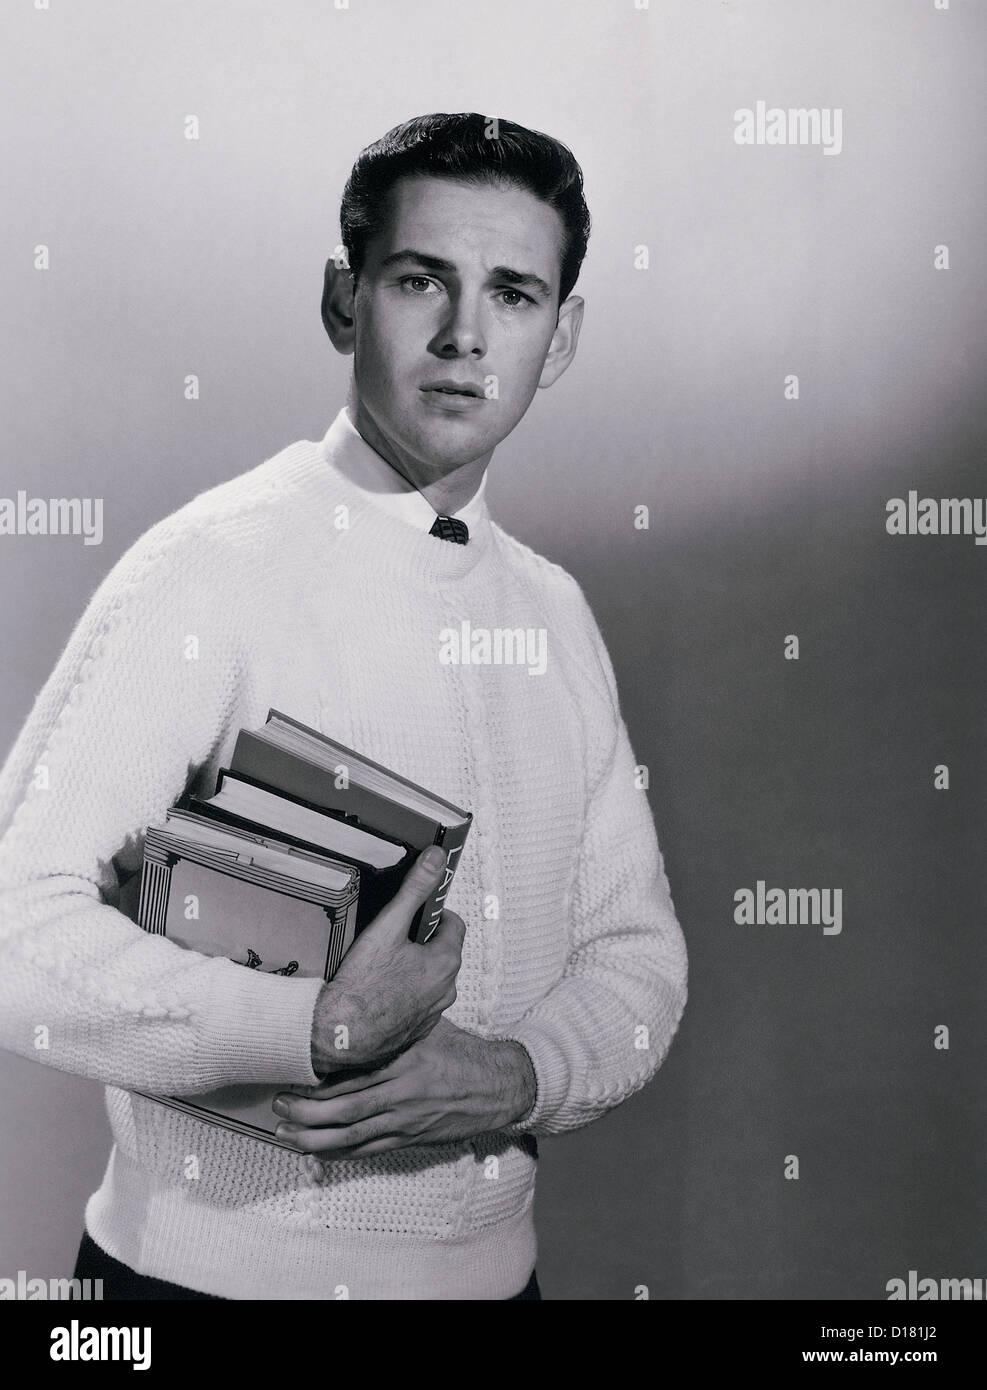 Student, School boy, vintage - Stock Image